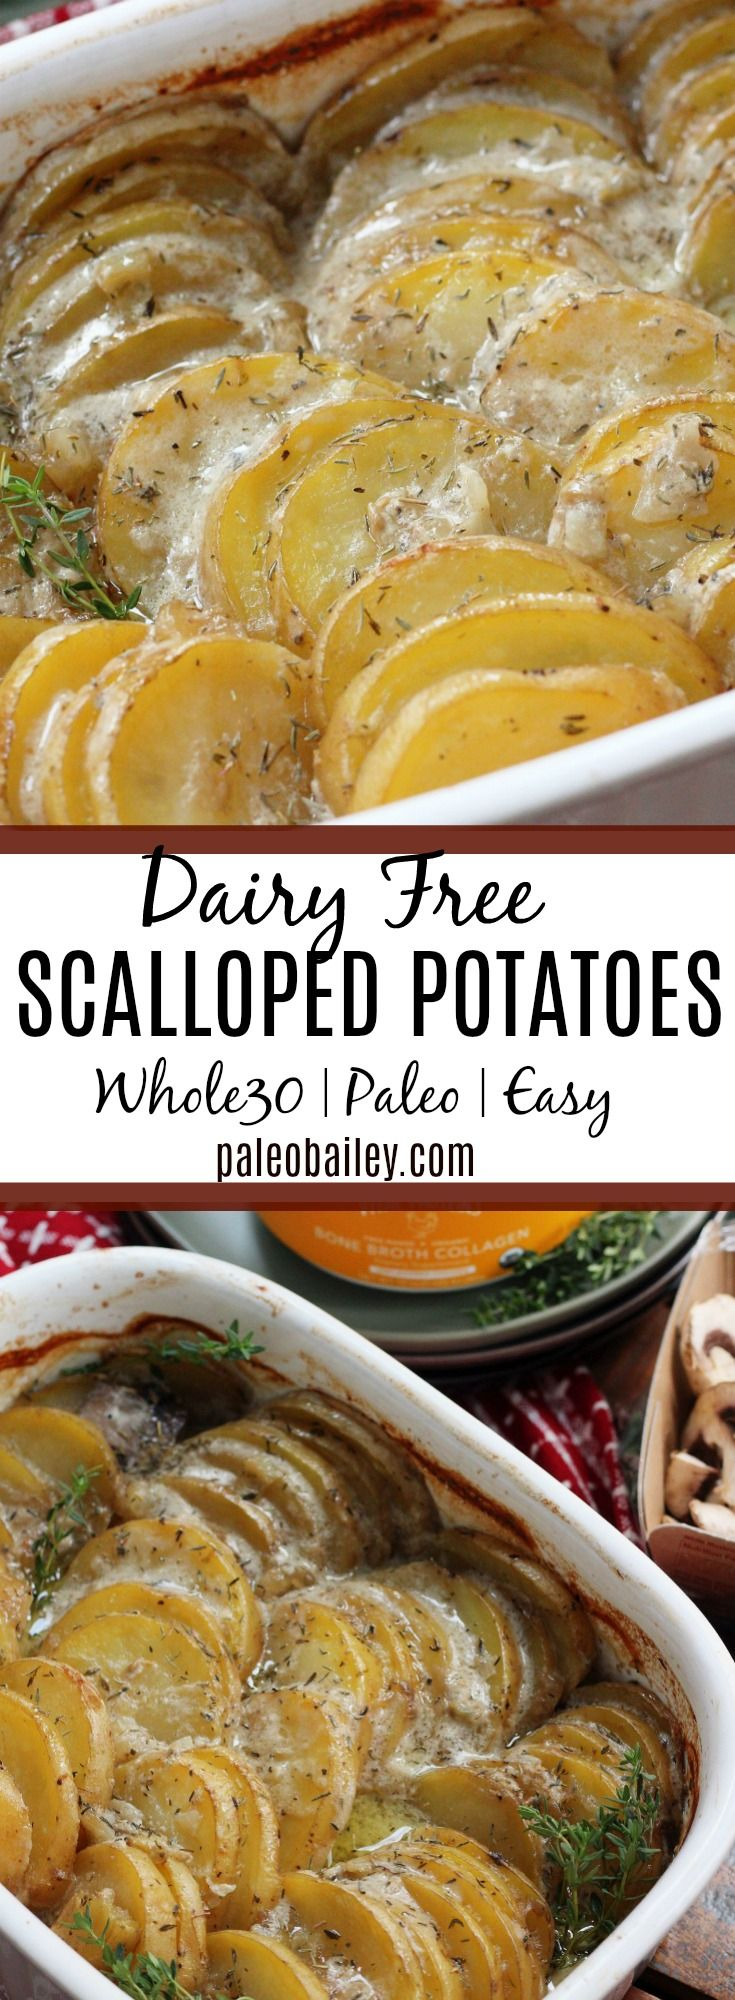 Scalloped Potatoes with Mushroom & Rosemary: Paleo, Whole30, Dairy Free!